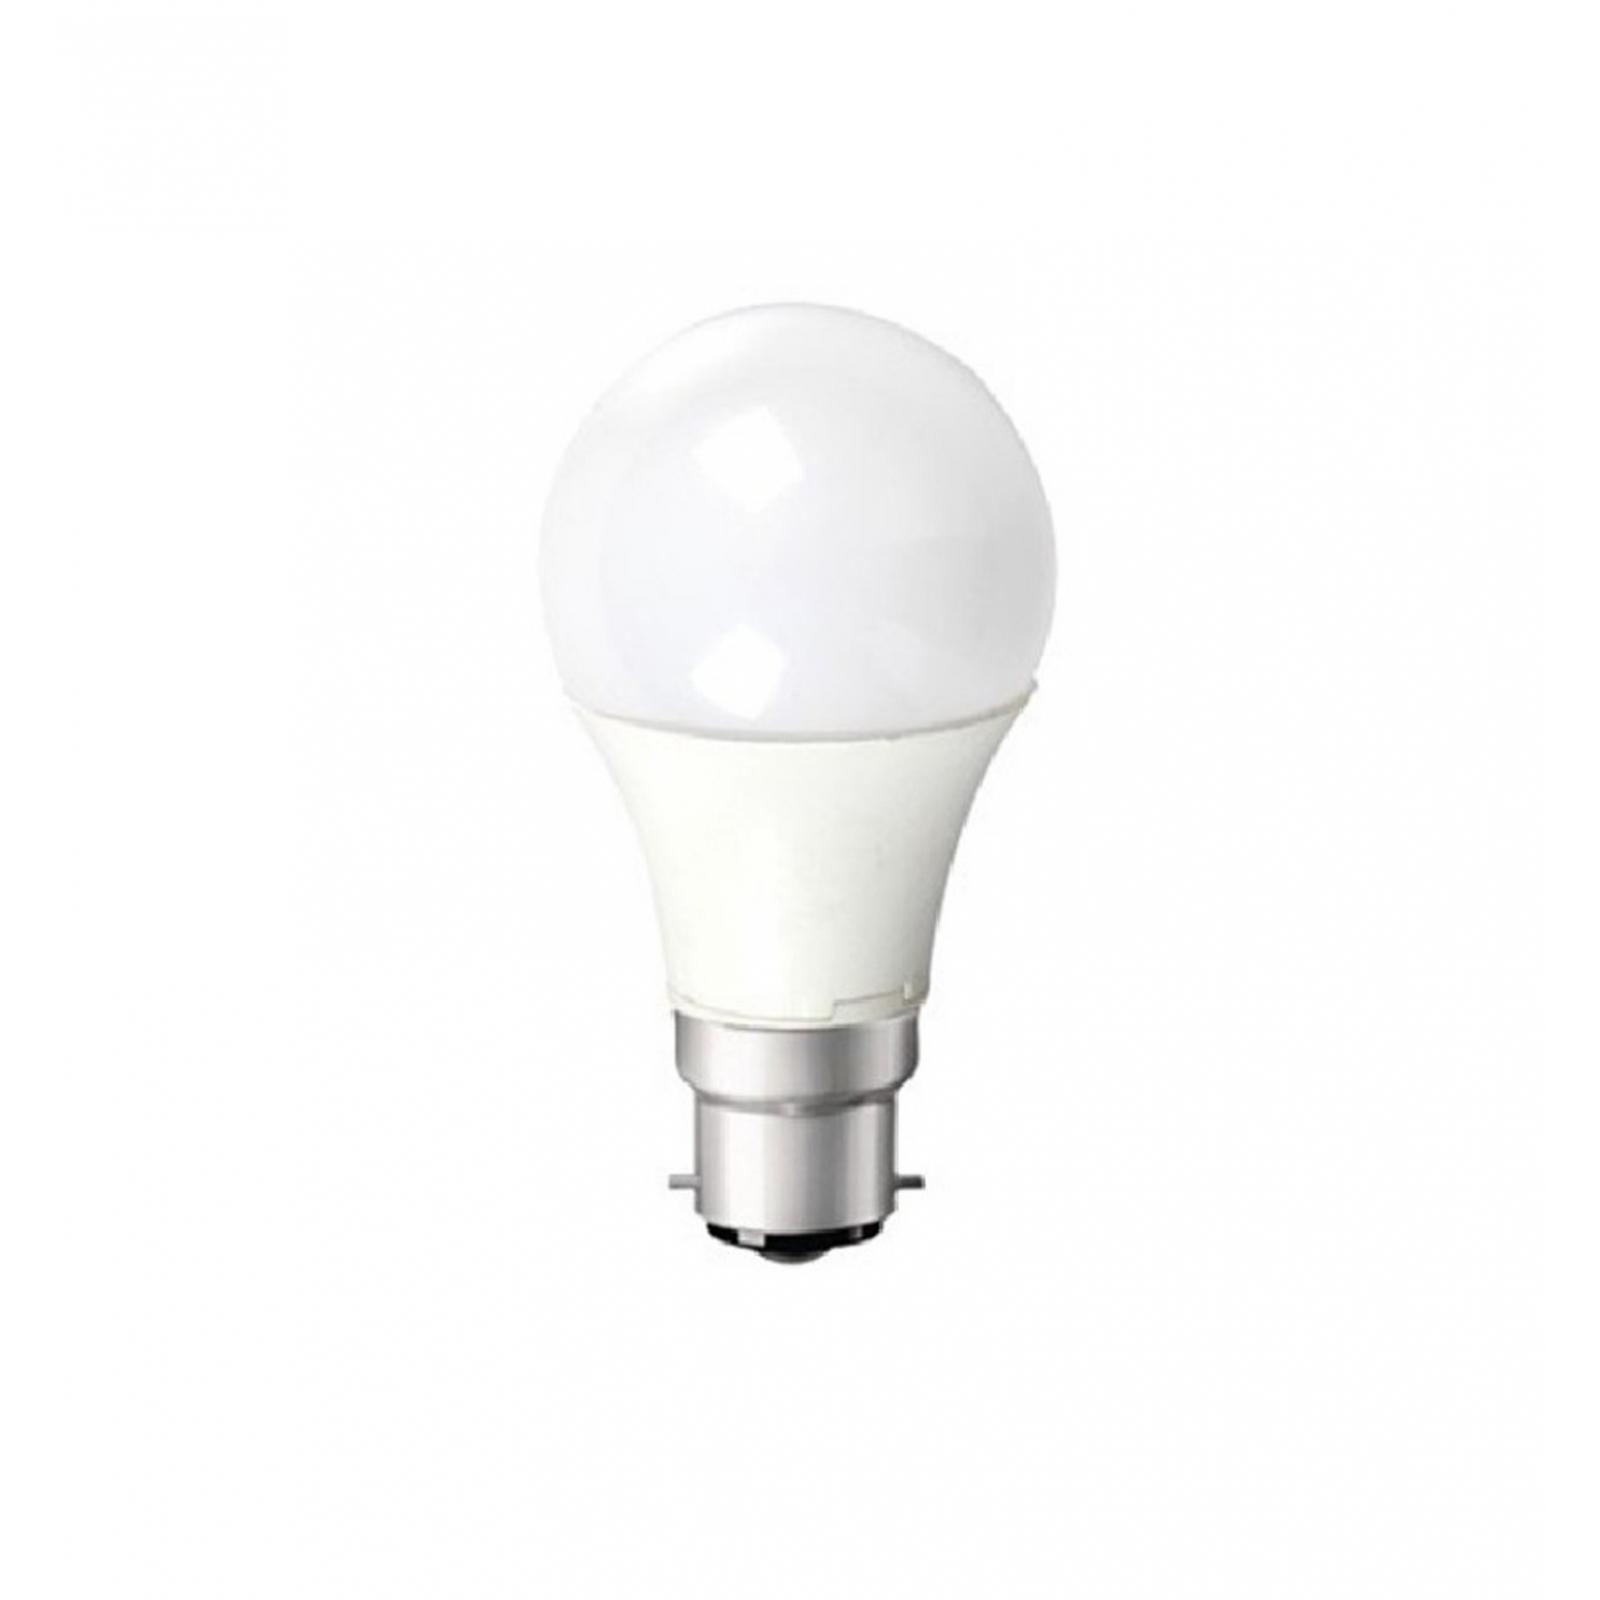 Ampoule LED B22 12W Blanc Chaud 3000K